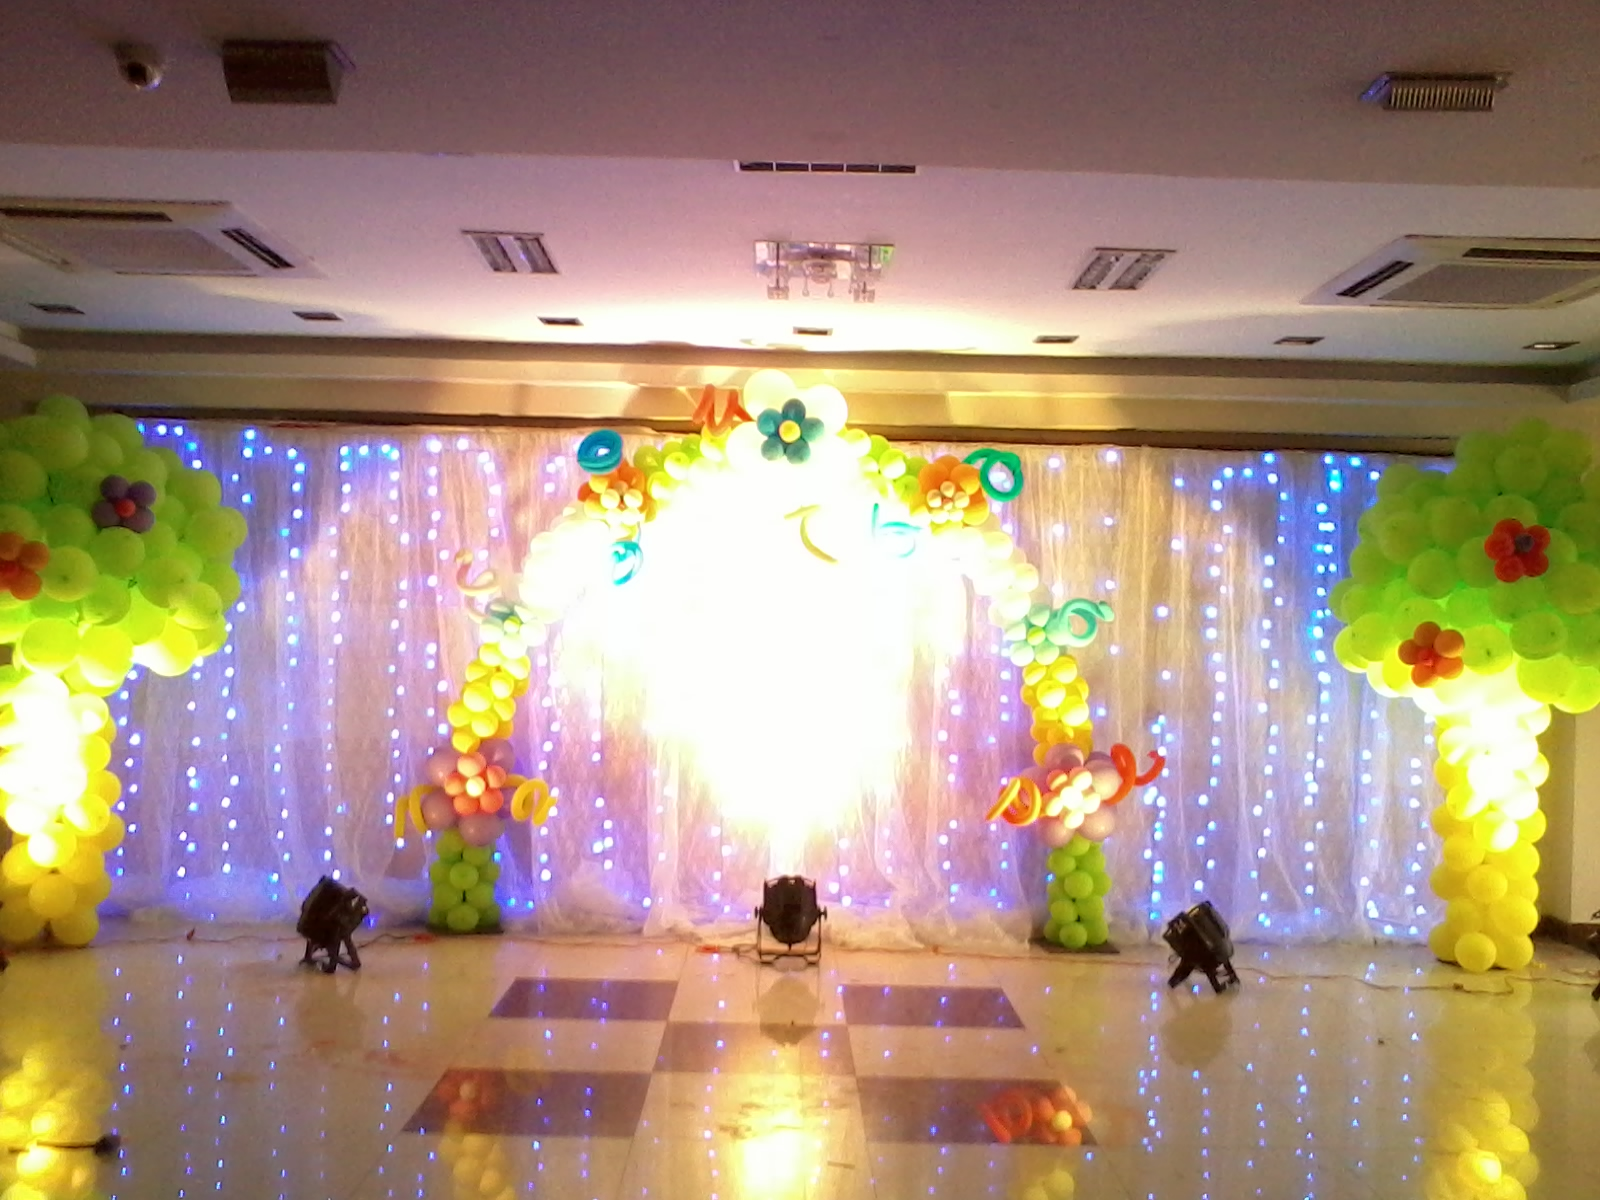 Birthday party decorations Boys   Girls Themes. Birthday party decorations Boys   Girls Themes in hyderabad